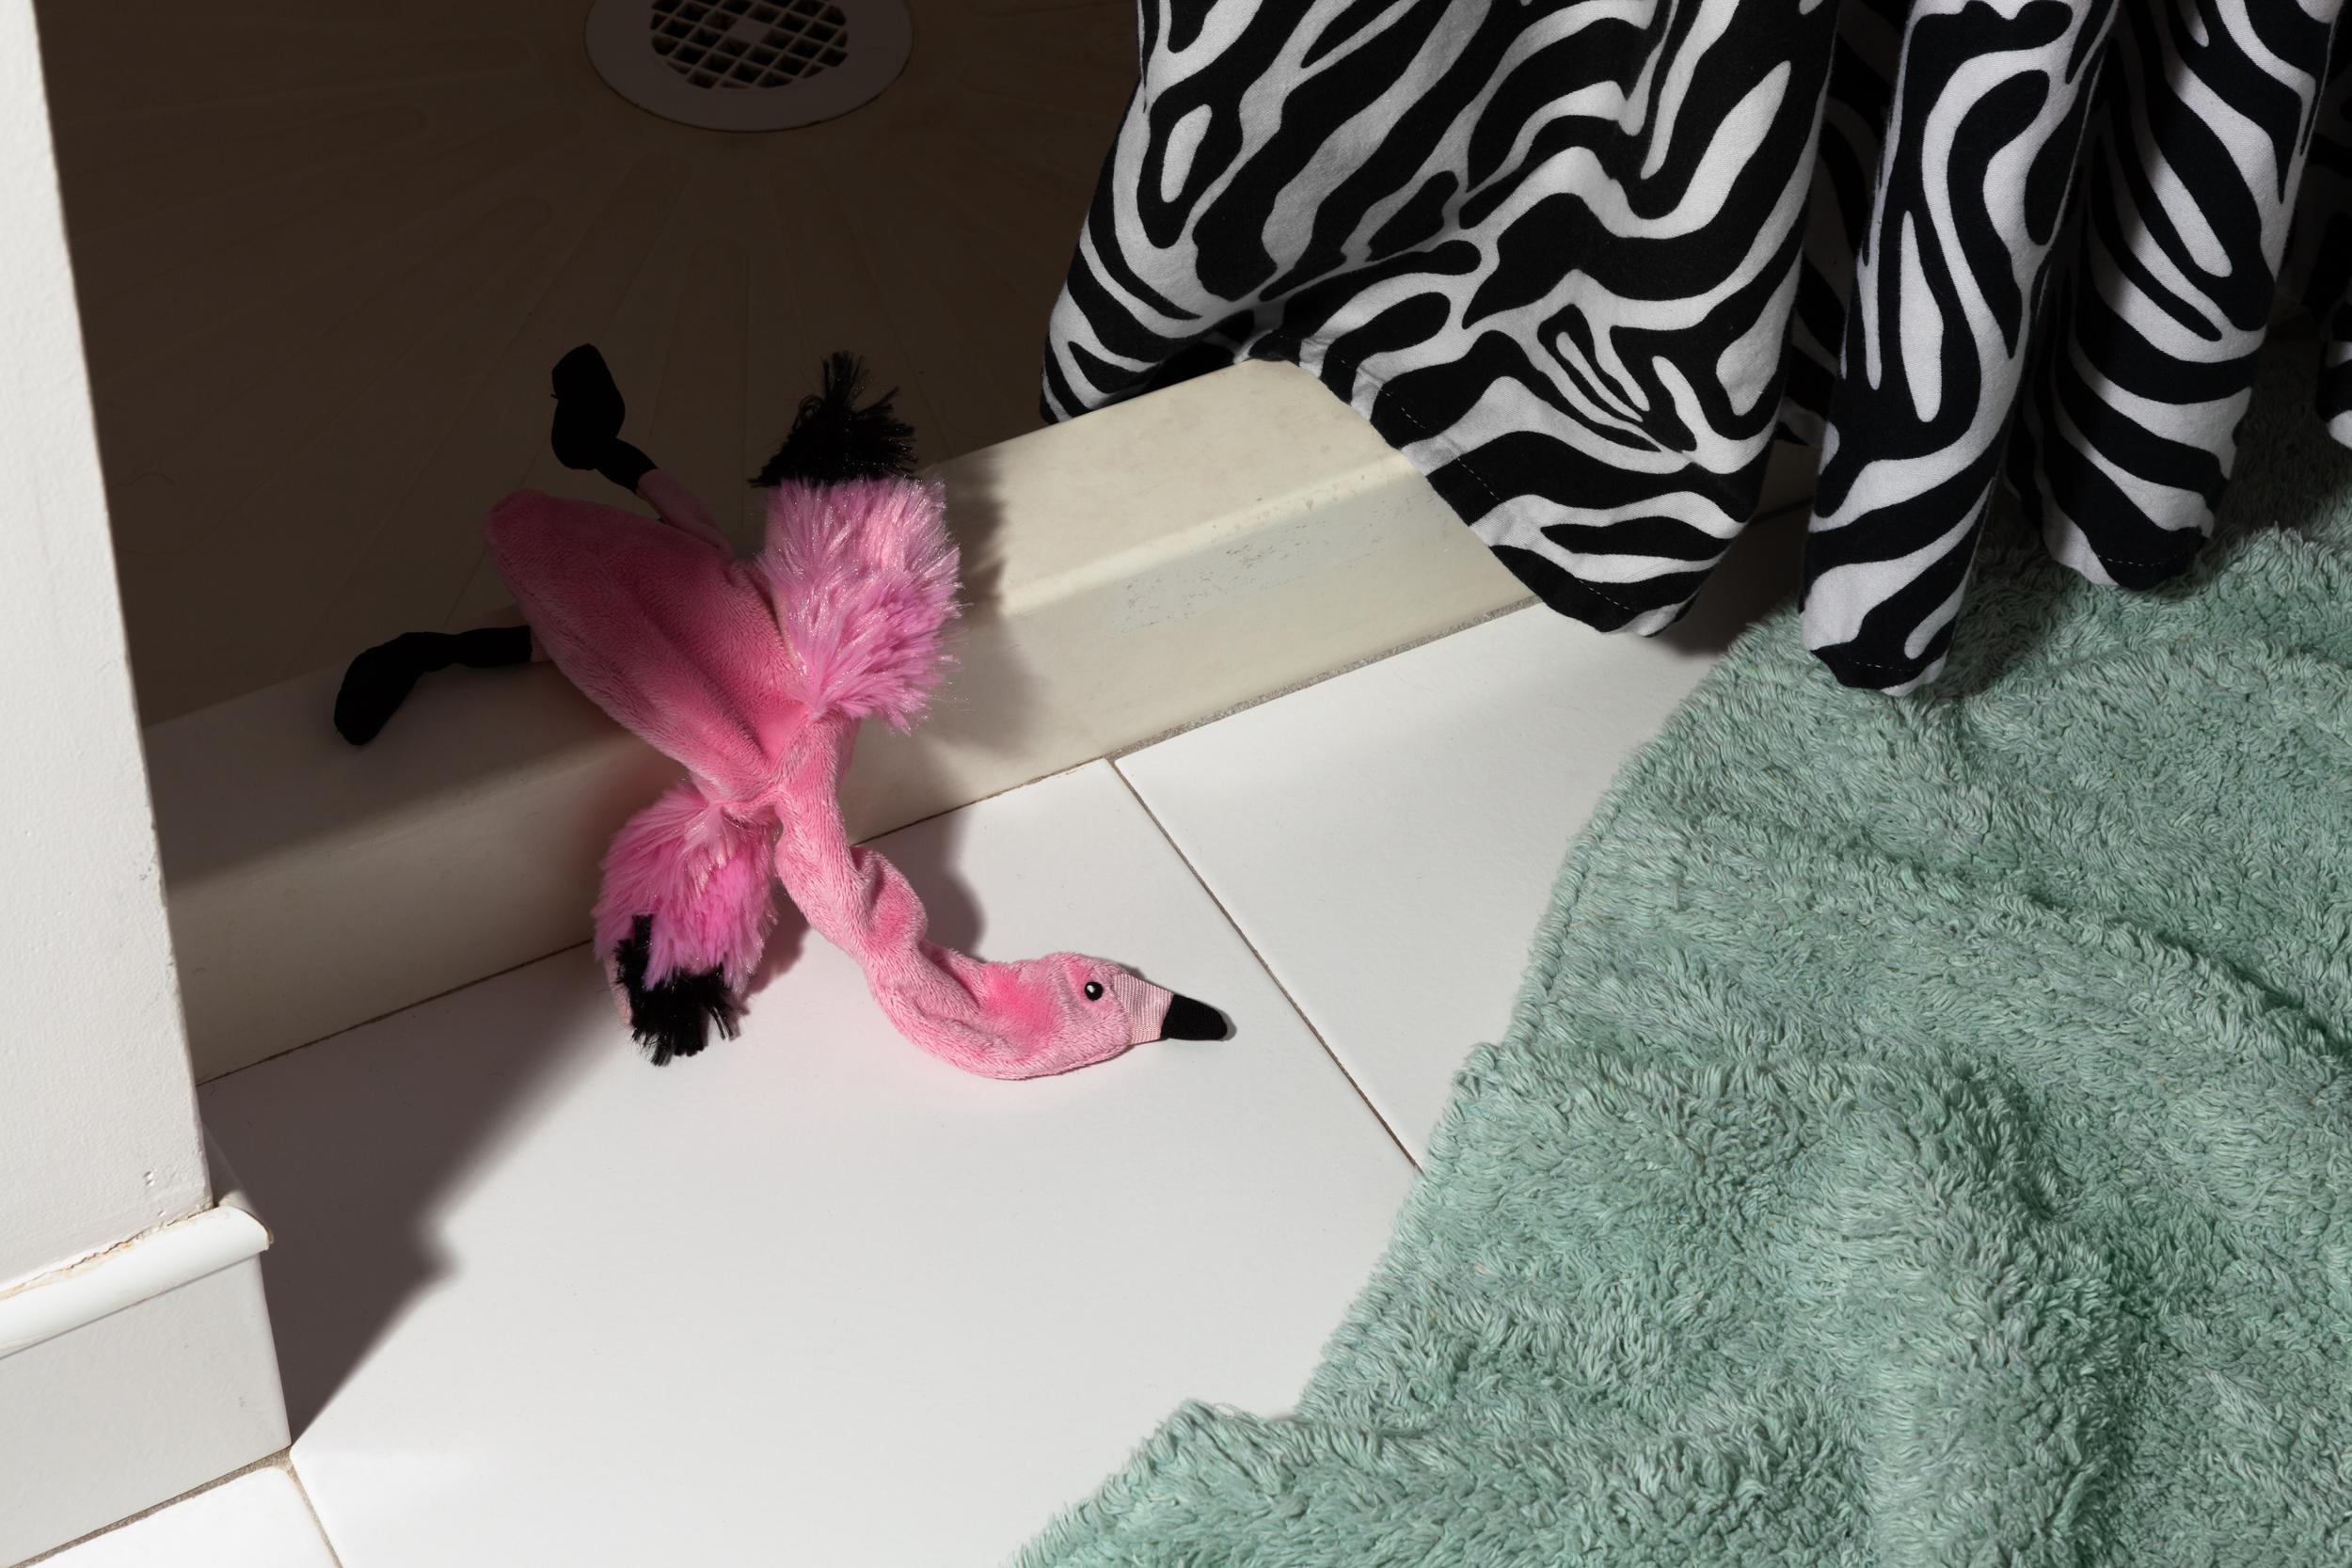 Morbidity & Mortality: Flamingo